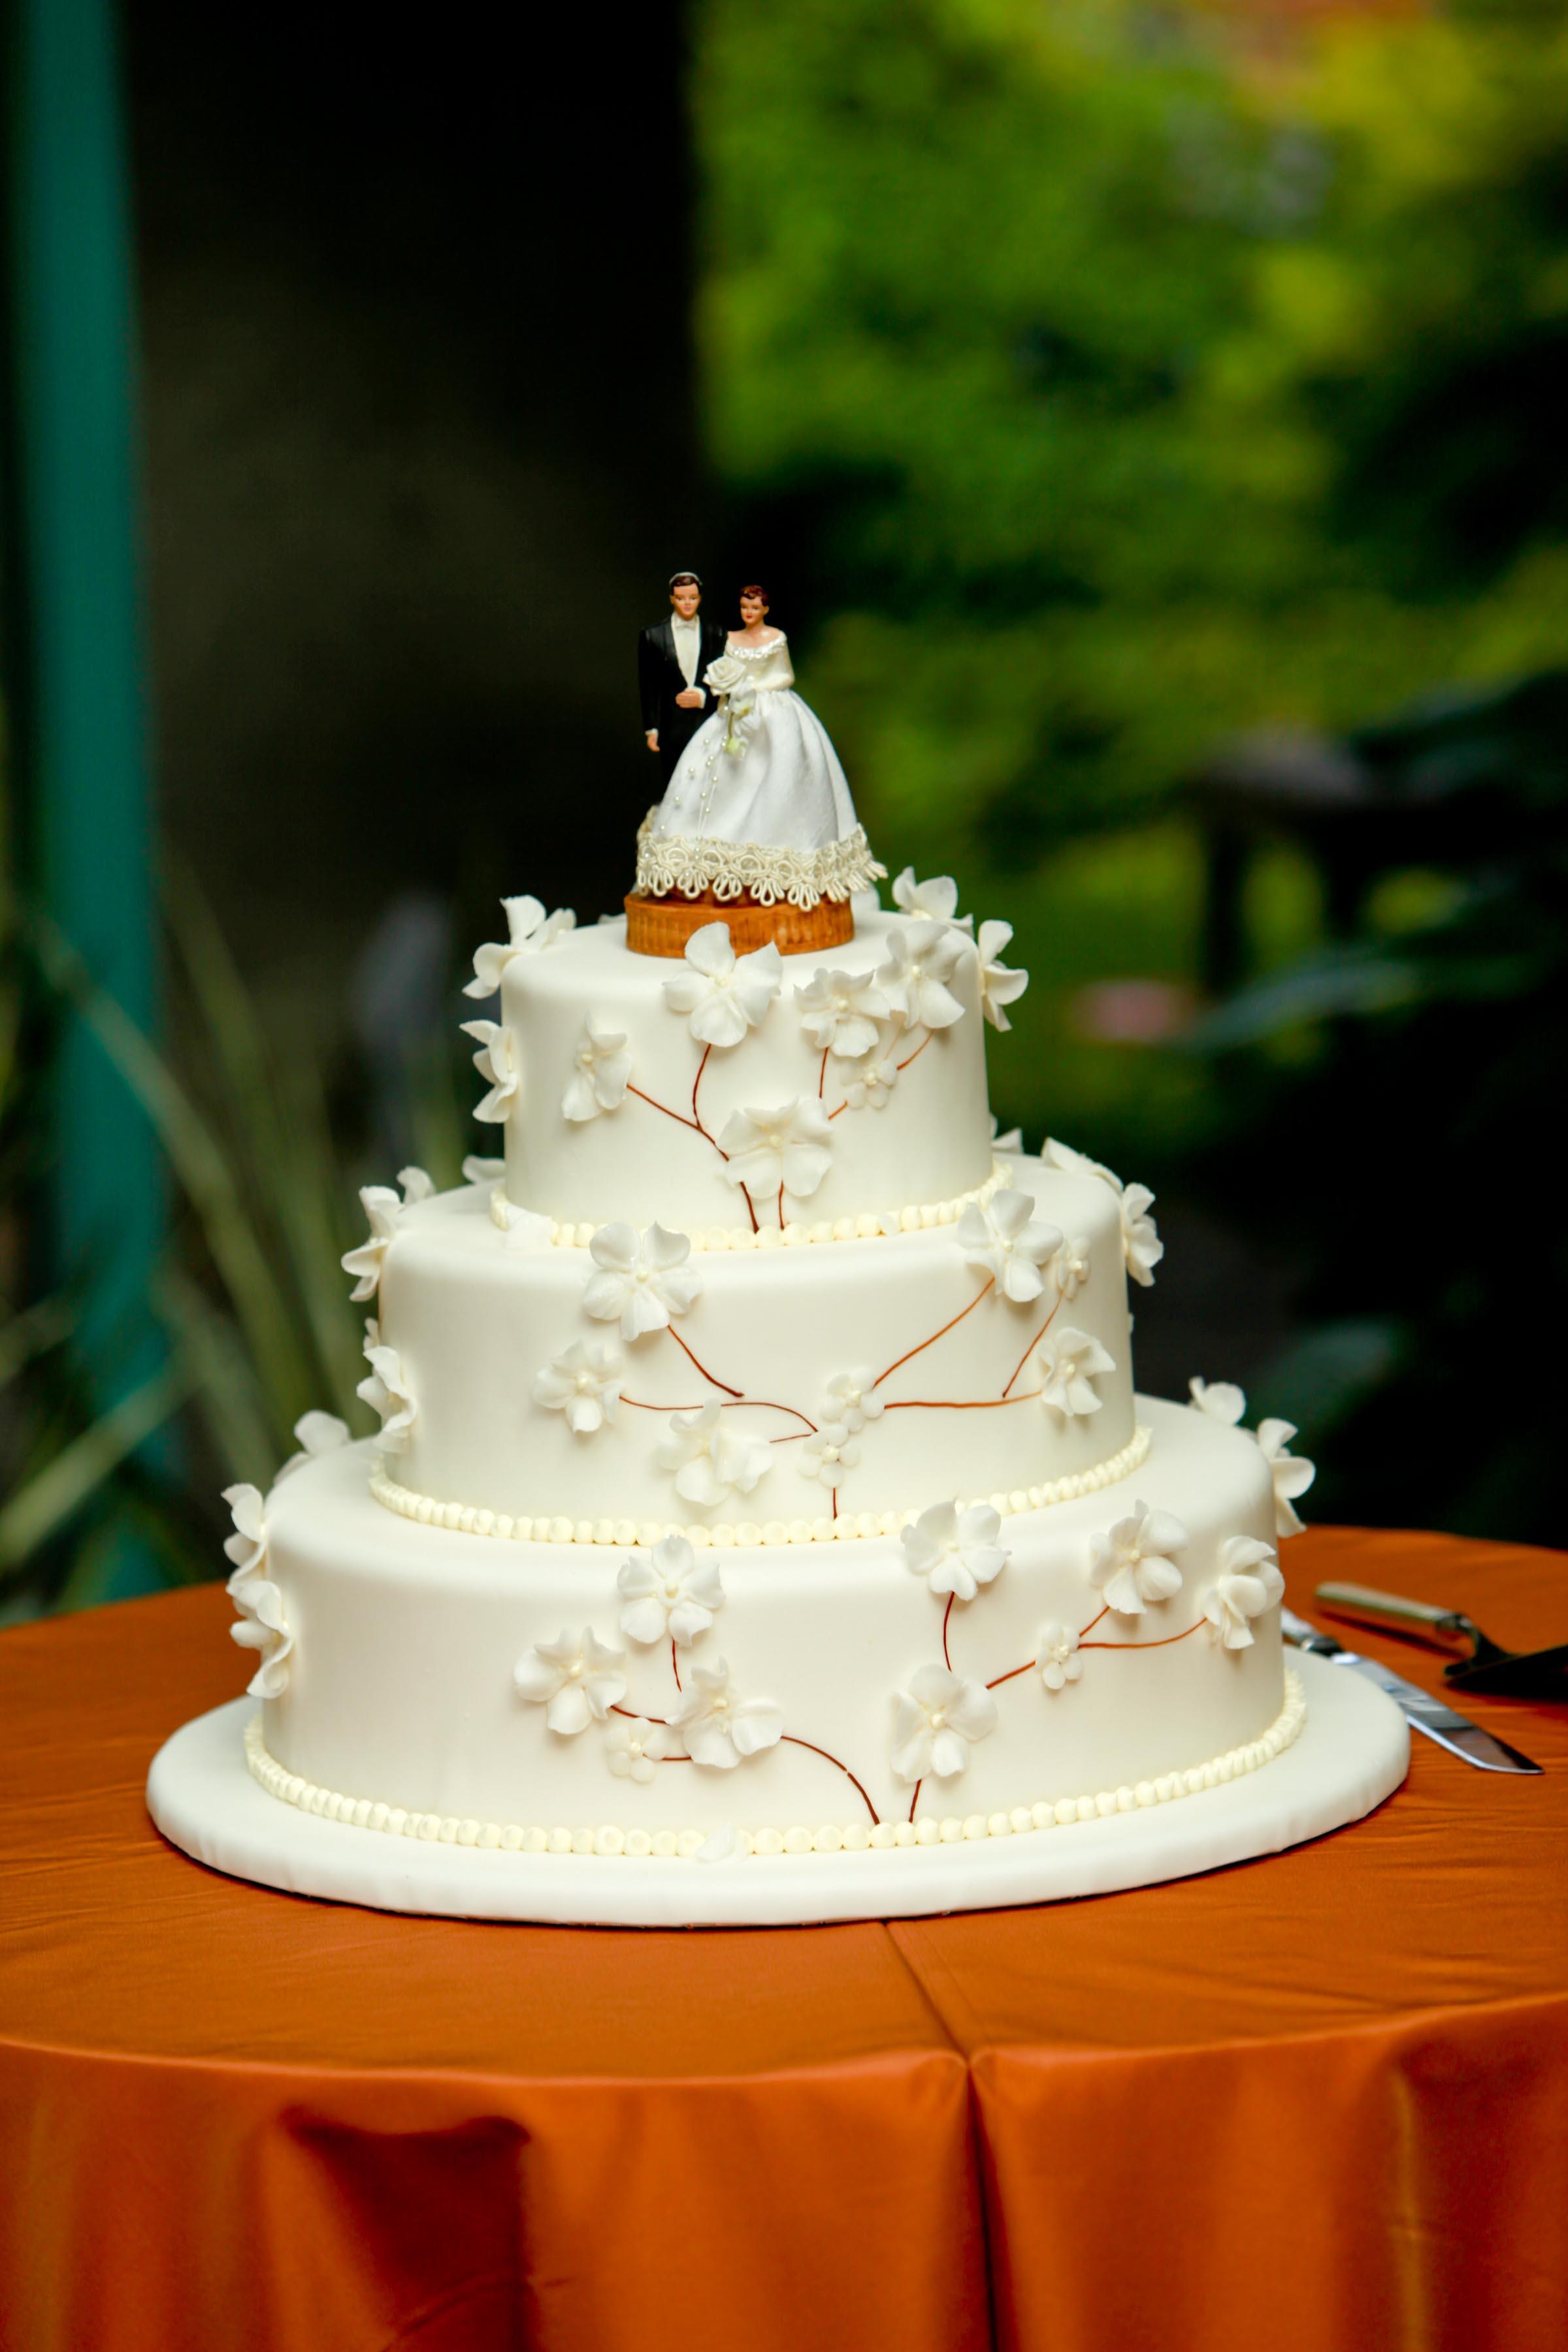 Windows Catering Grand Marnier wedding cake at Meadowlark fall